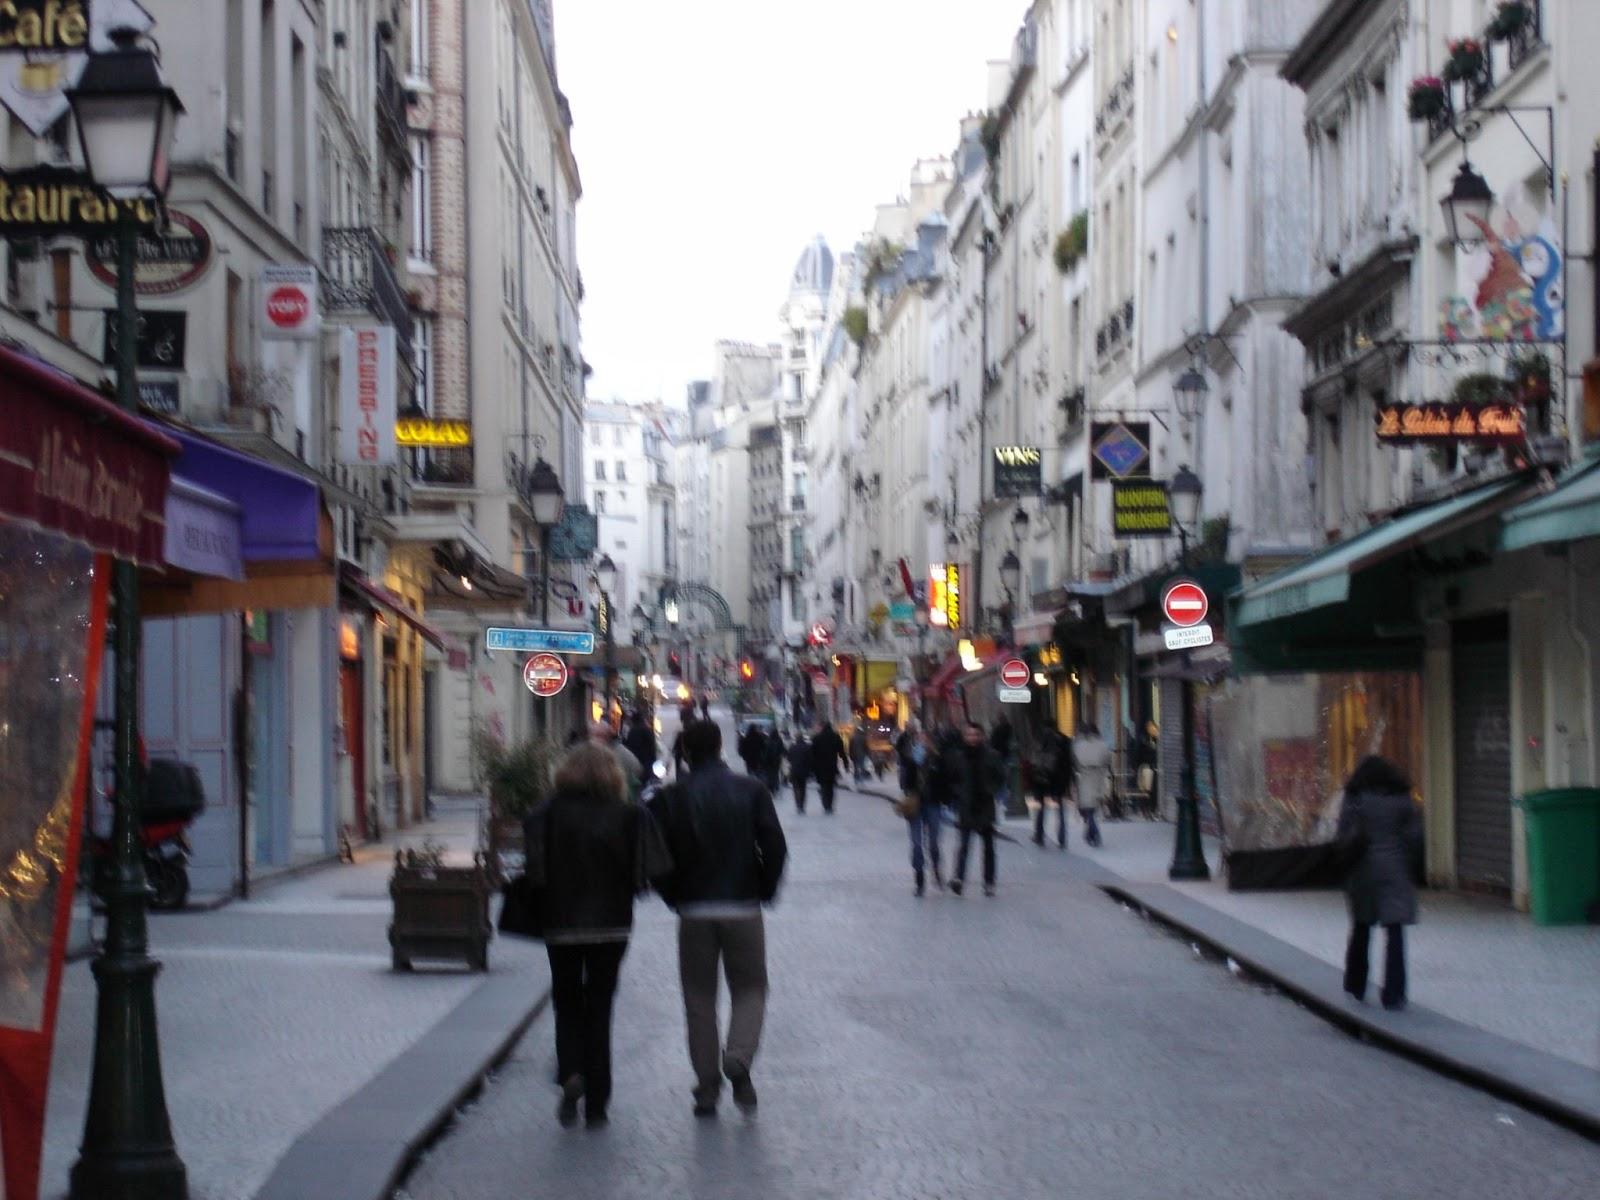 paris city street hd - photo #28